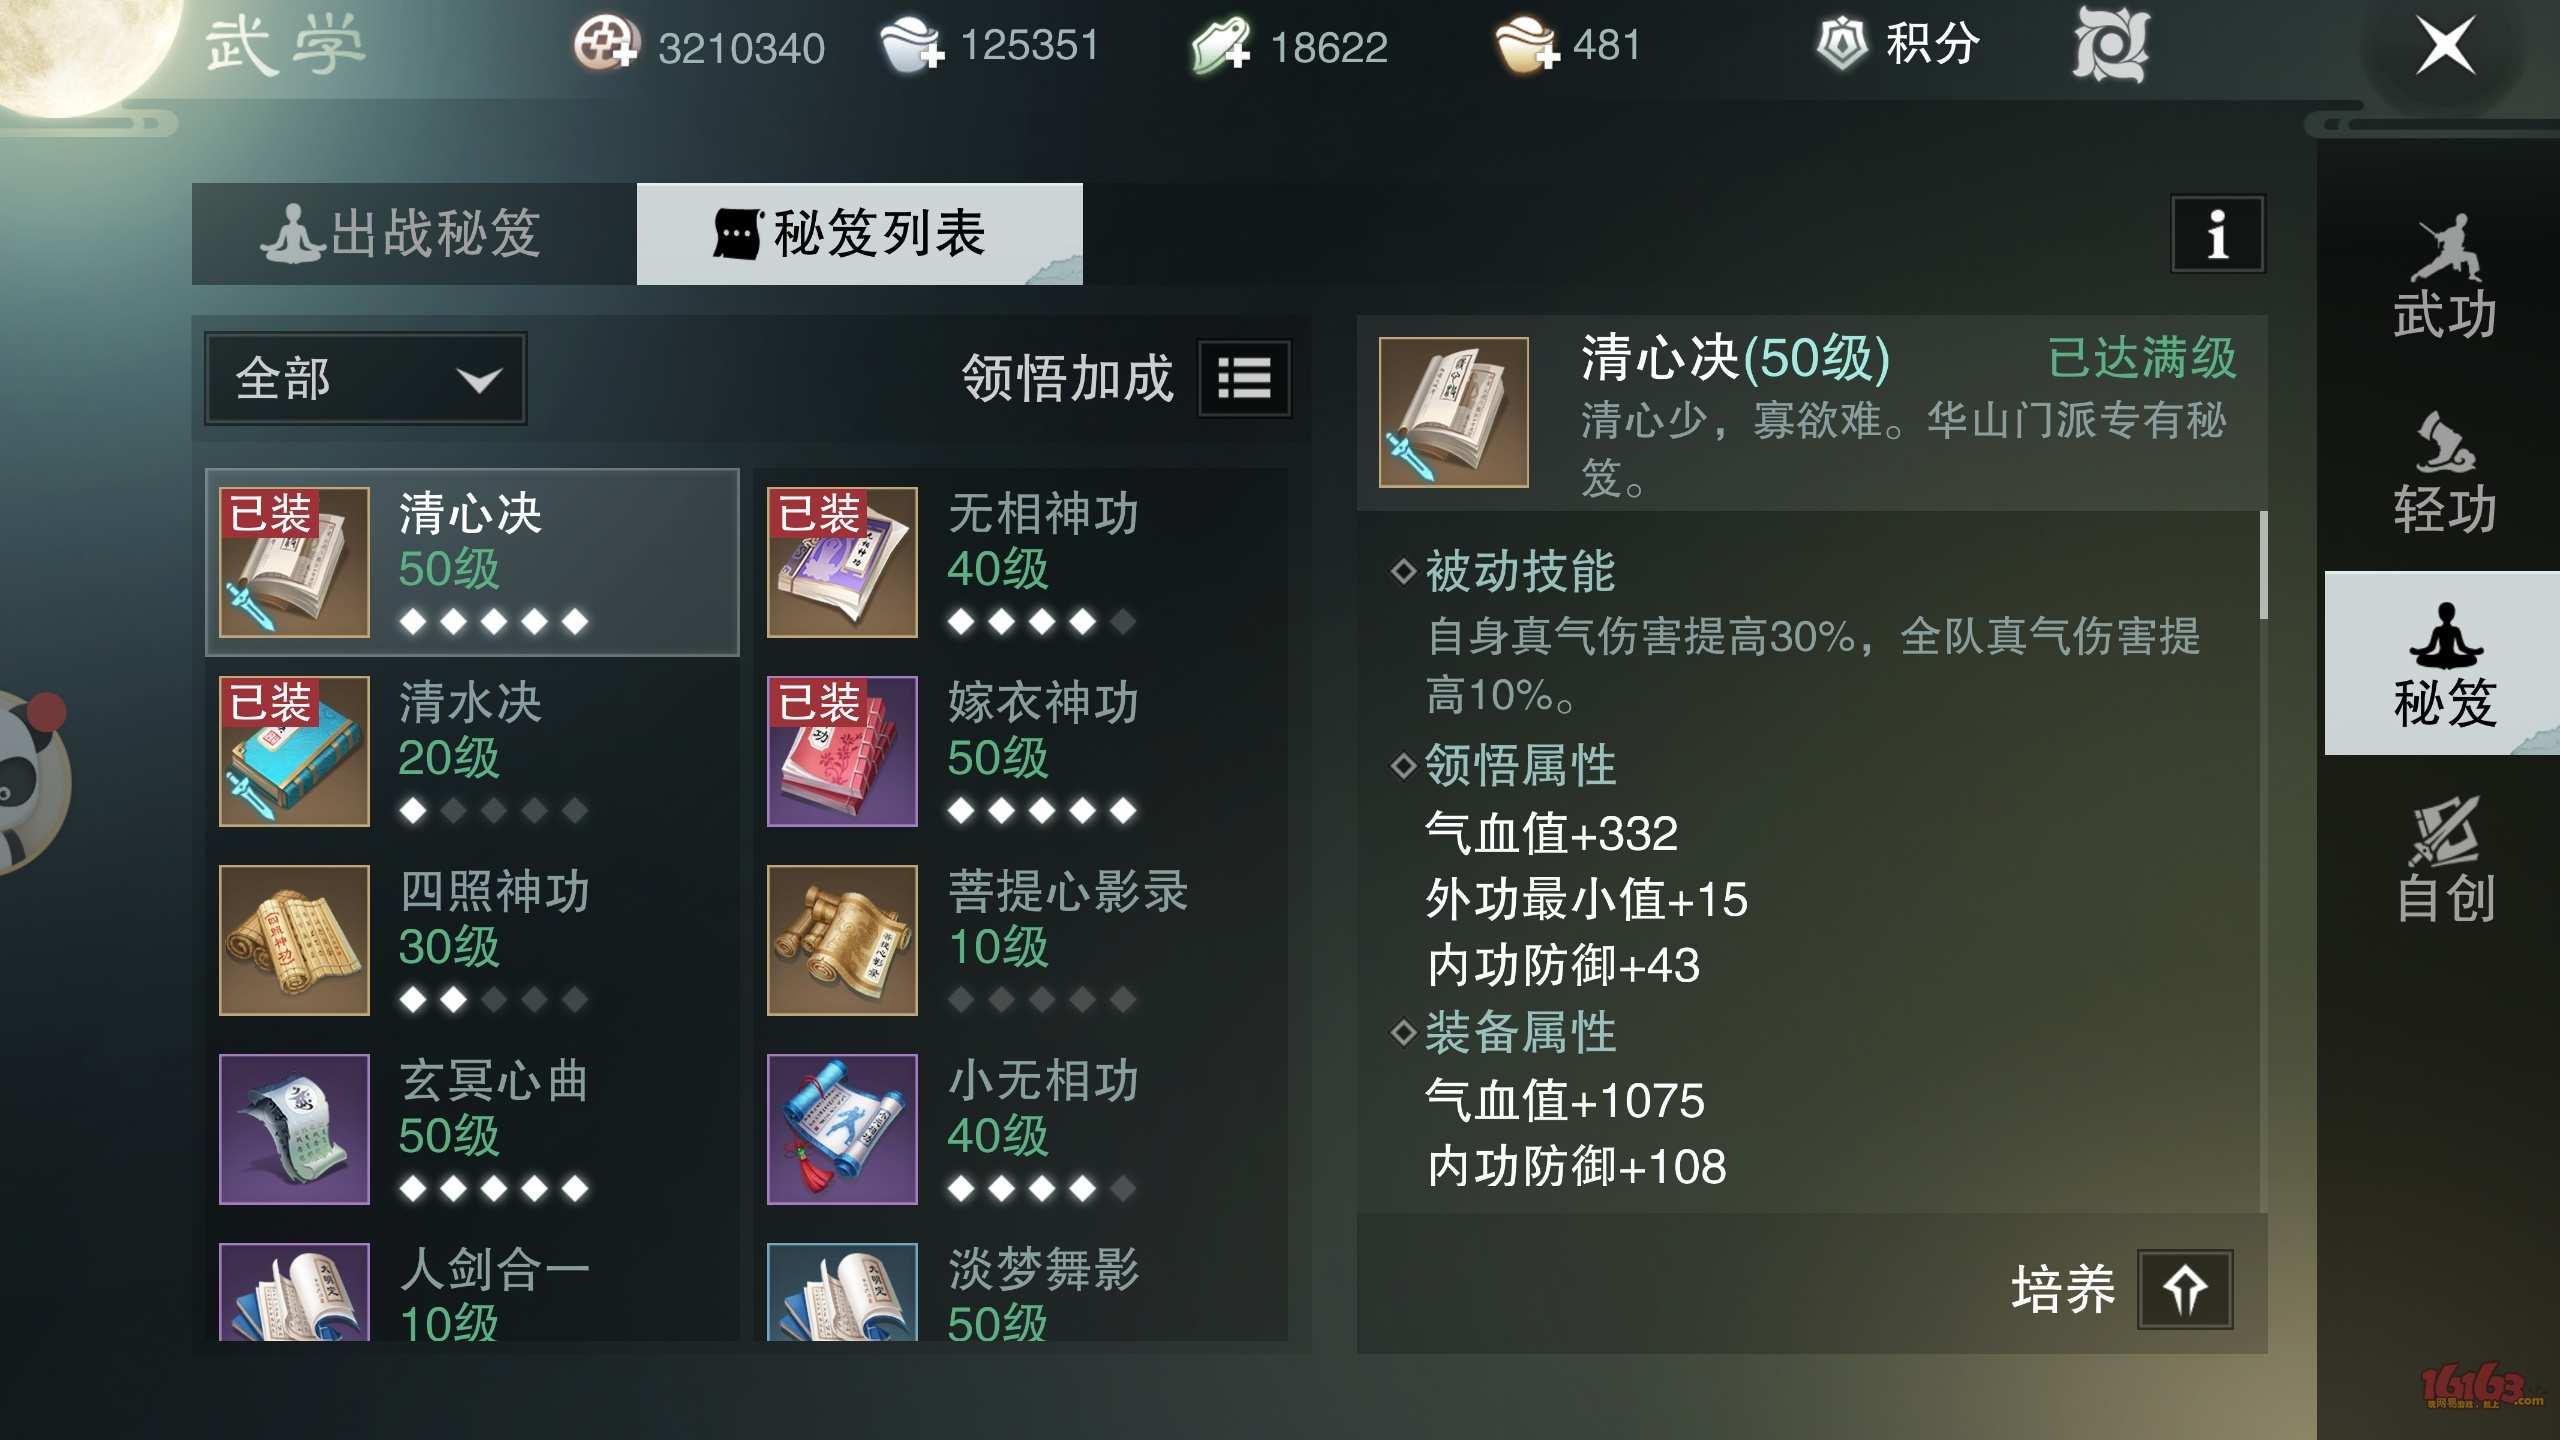 S80910-213517.jpg